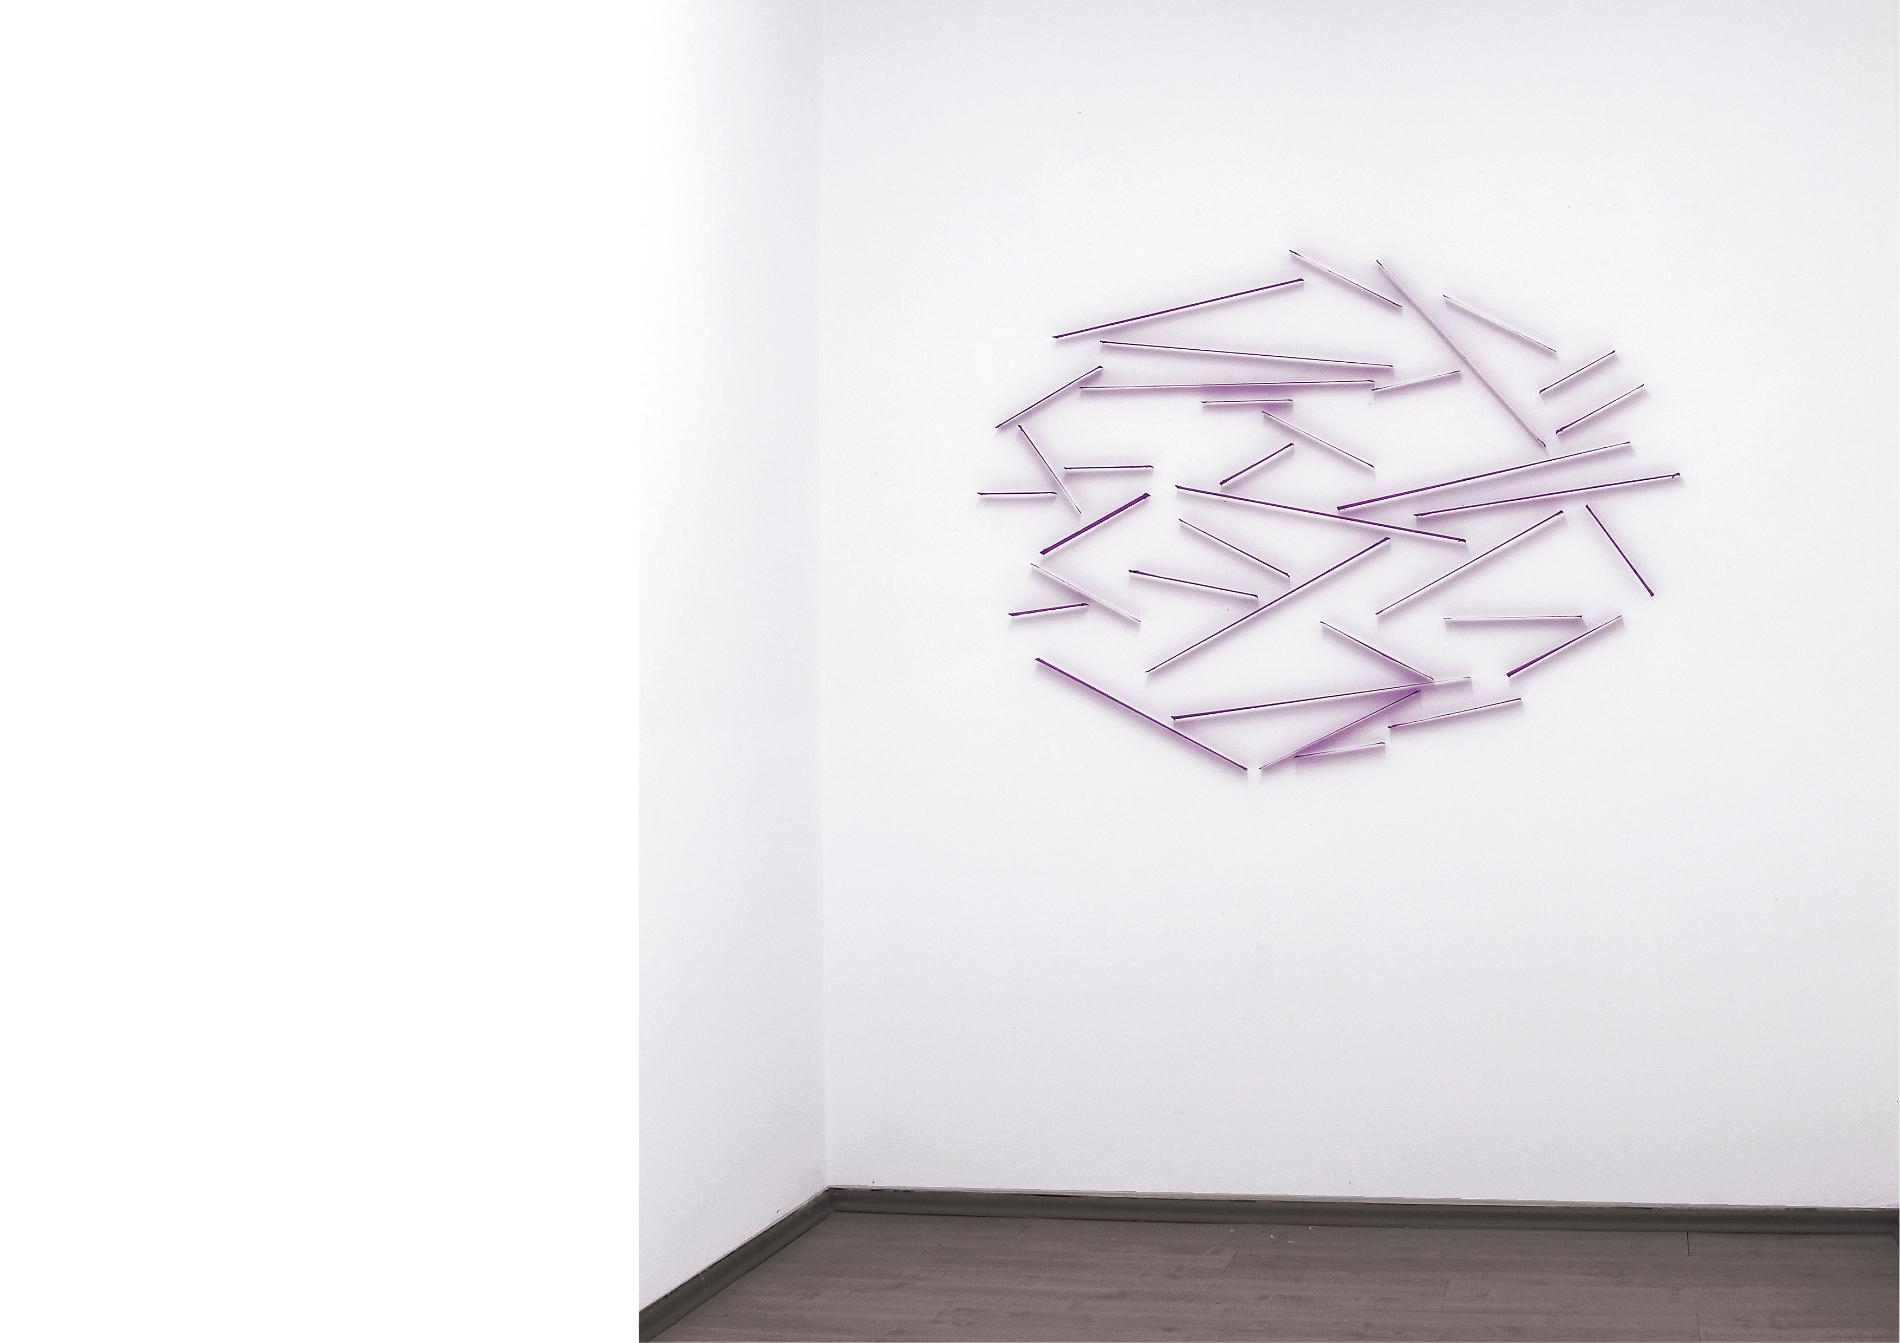 gh_oval_#1_2020_tissue, steel pins_100 x 140 x 3 cm